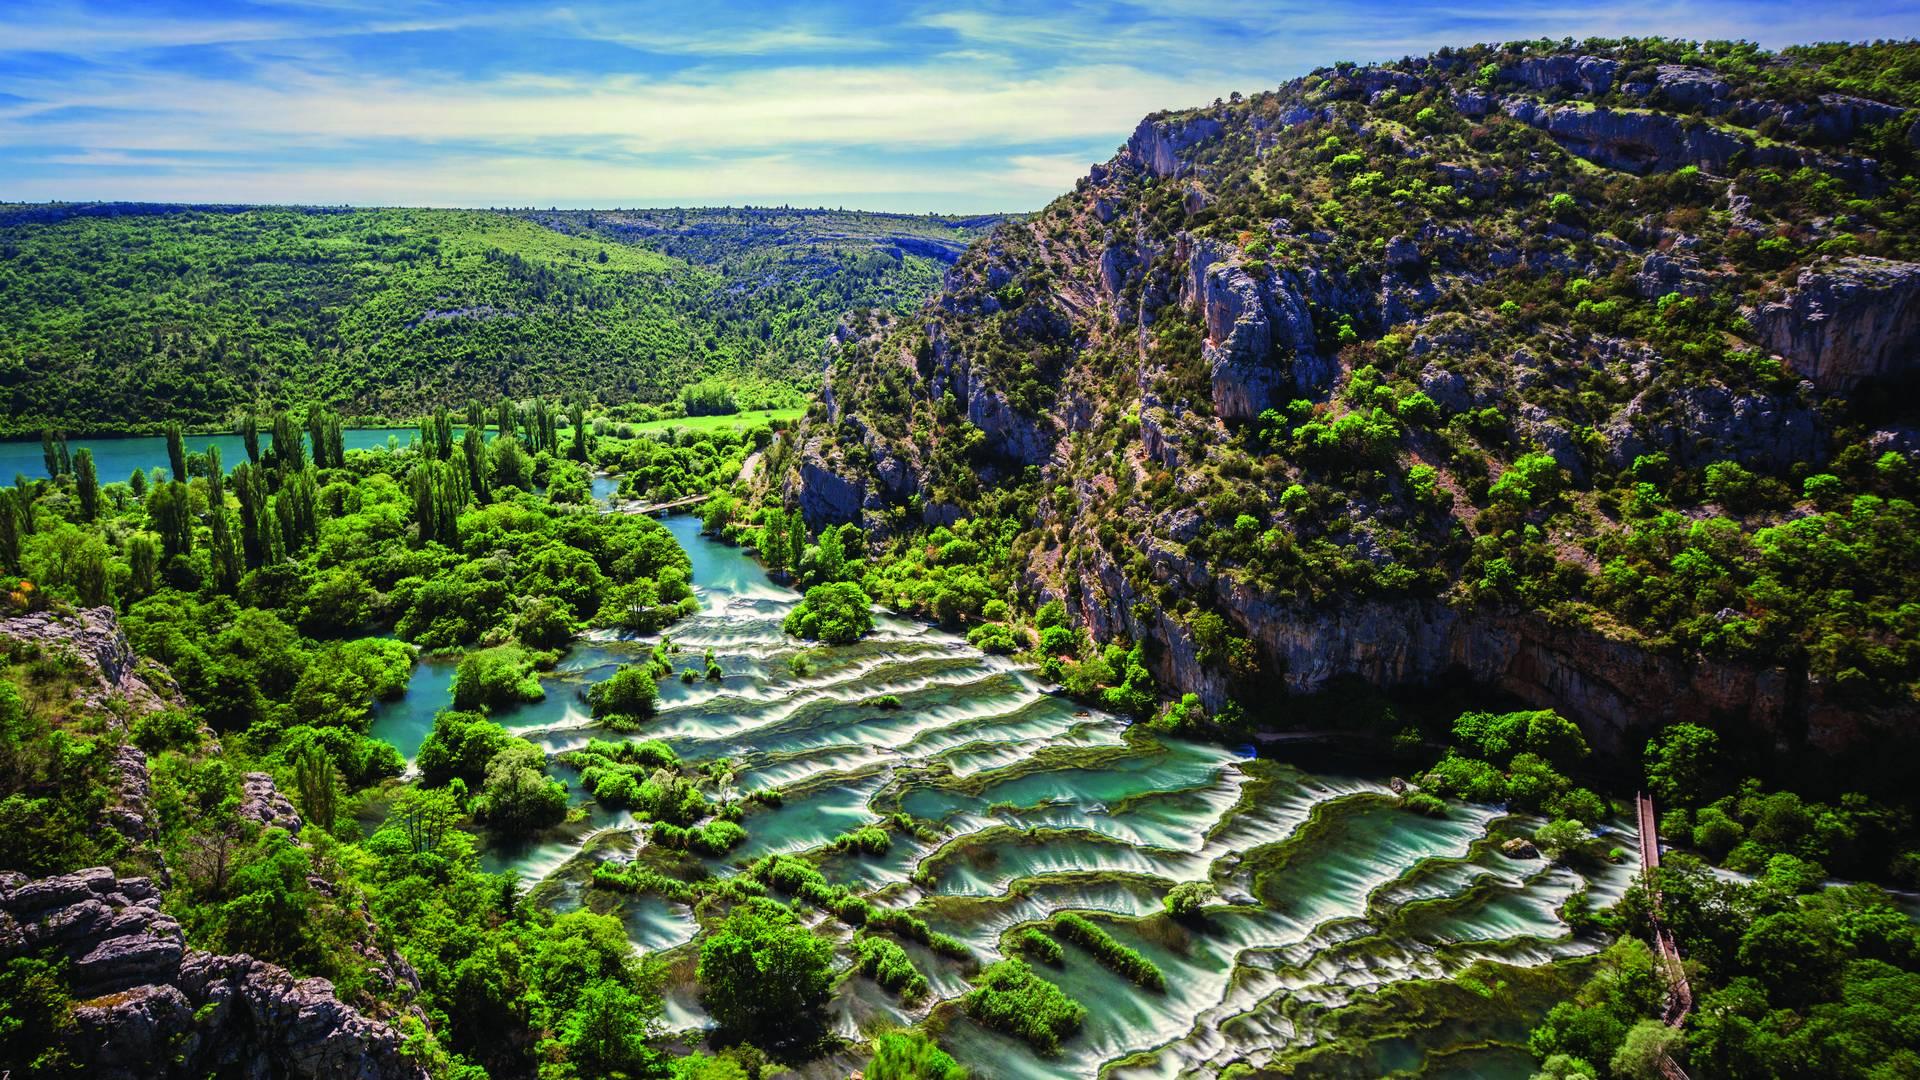 Roski slap Krka waterfalls